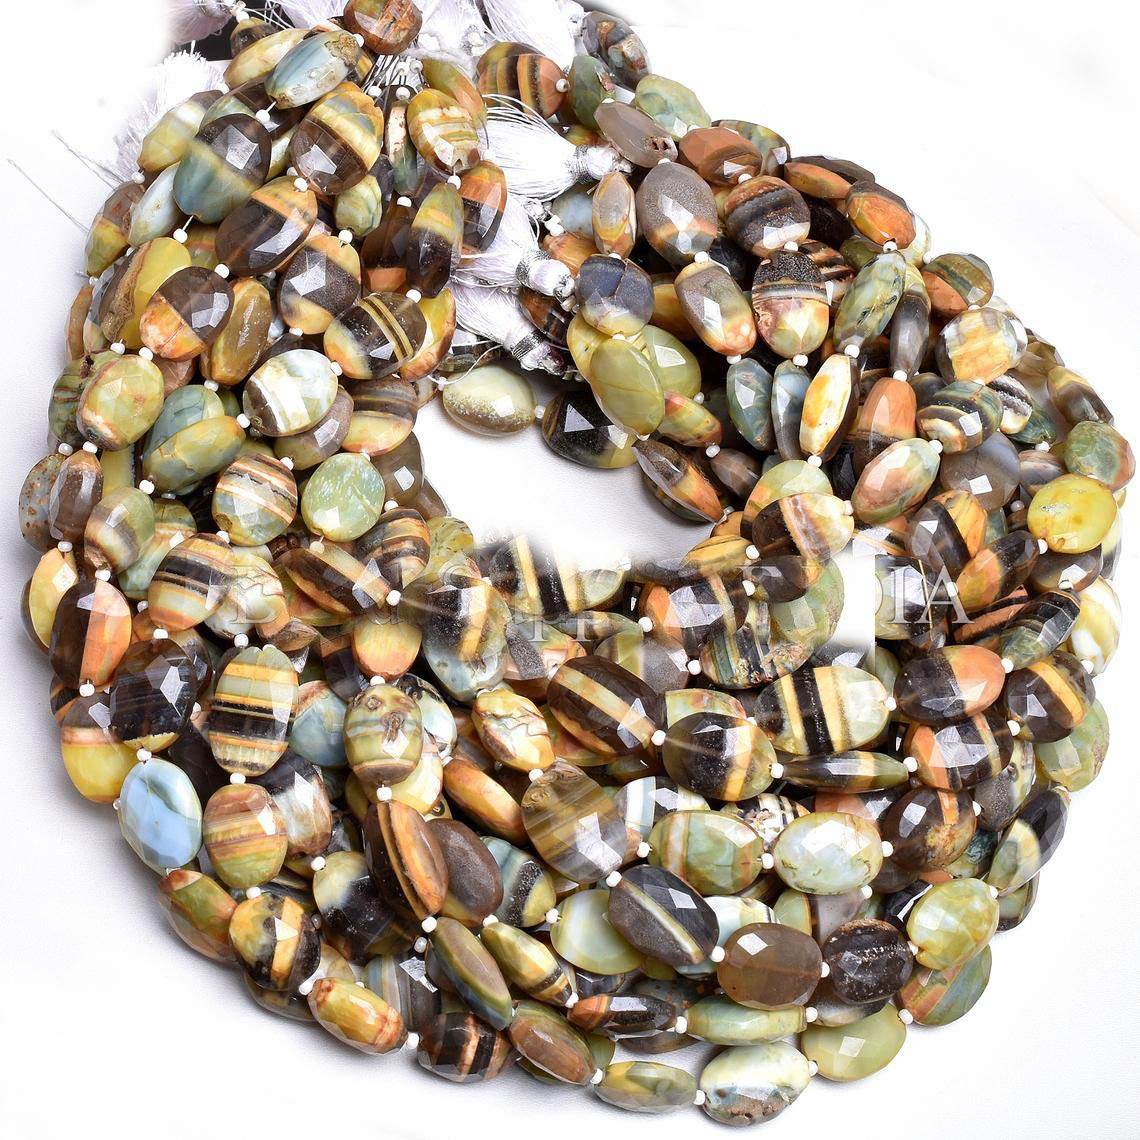 Shree Narayani AAA Quality Ranking TOP1 Boulder Loose Beads 11x14 sale Strand Opal